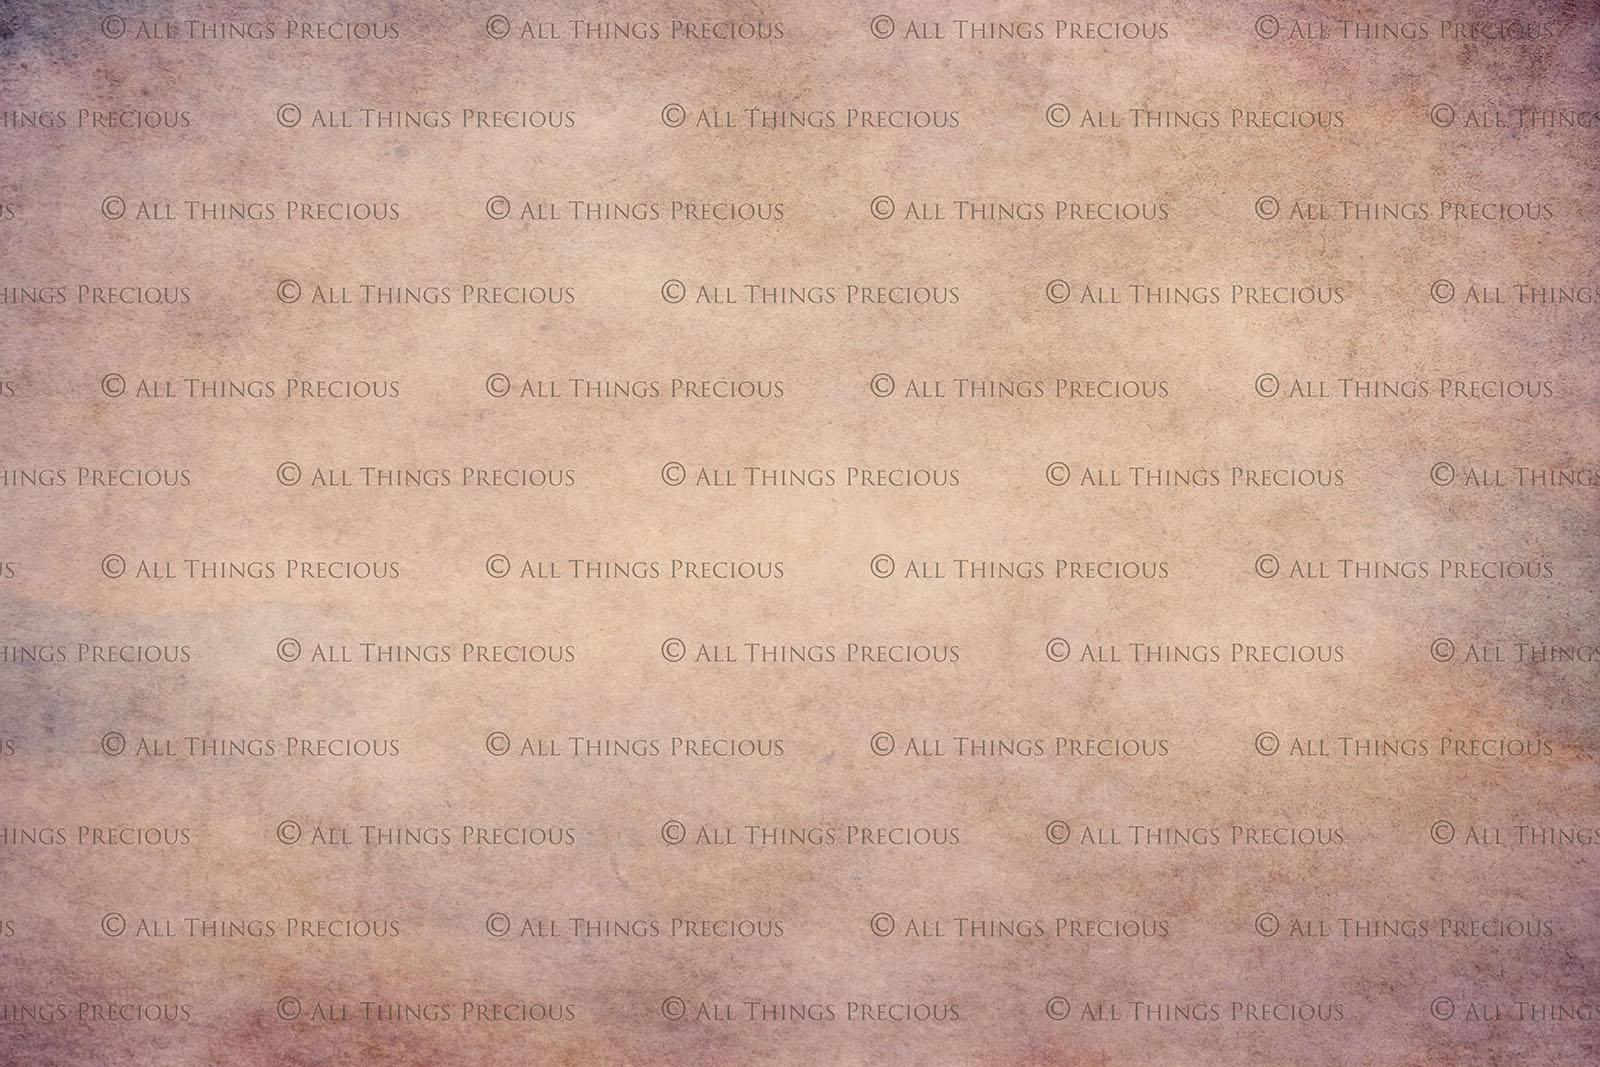 10 Fine Art BERRIES & CREAM Textures SET 1 example image 5